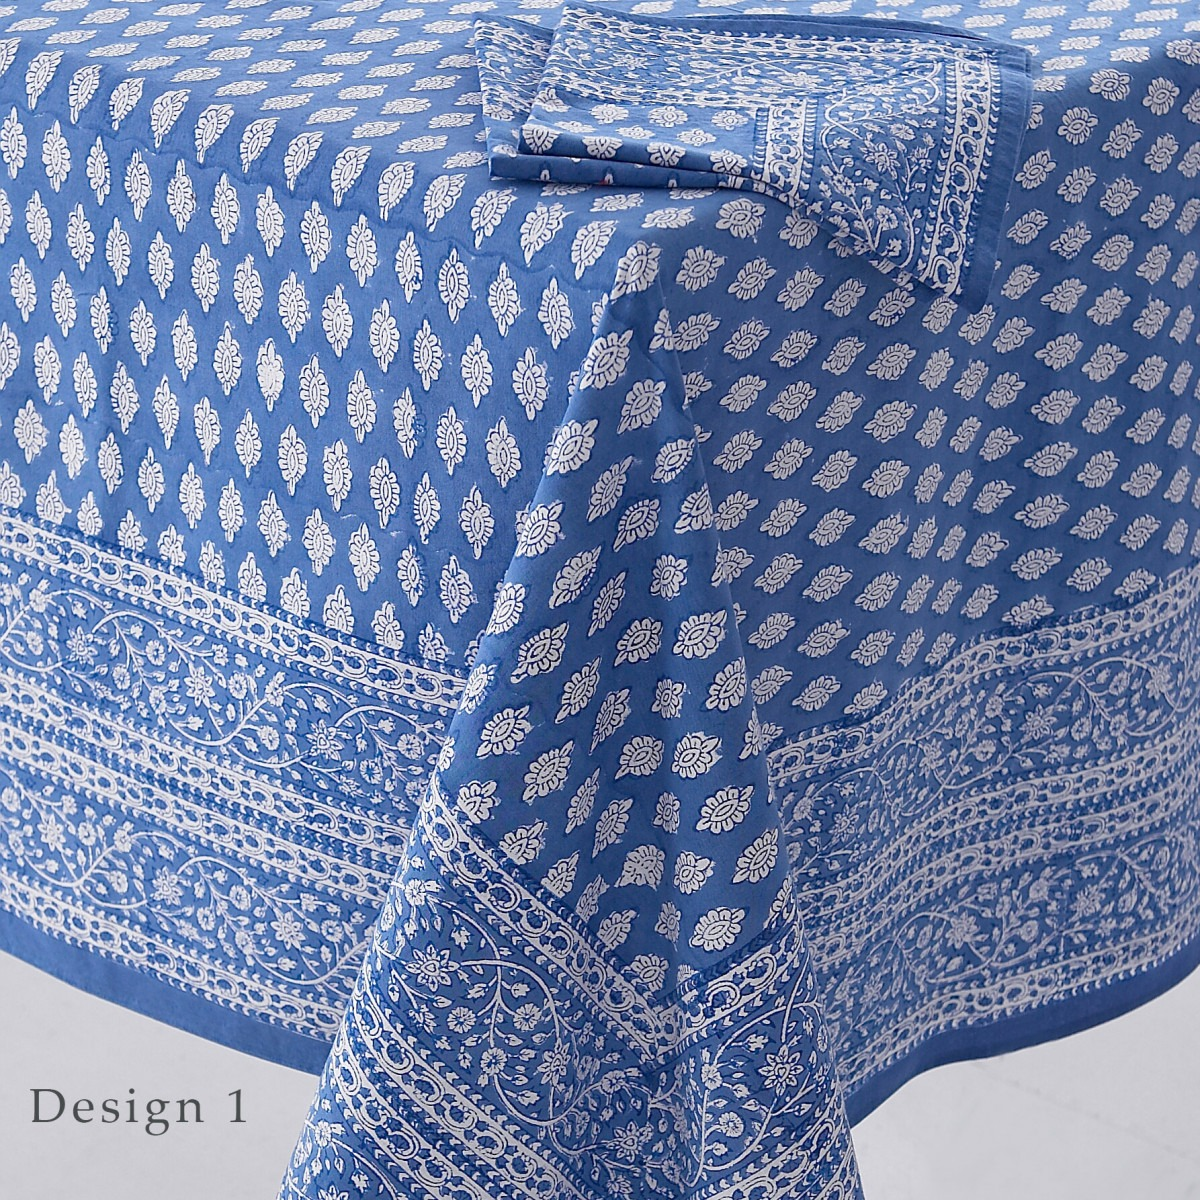 Block Printed Tablecloth Design 1